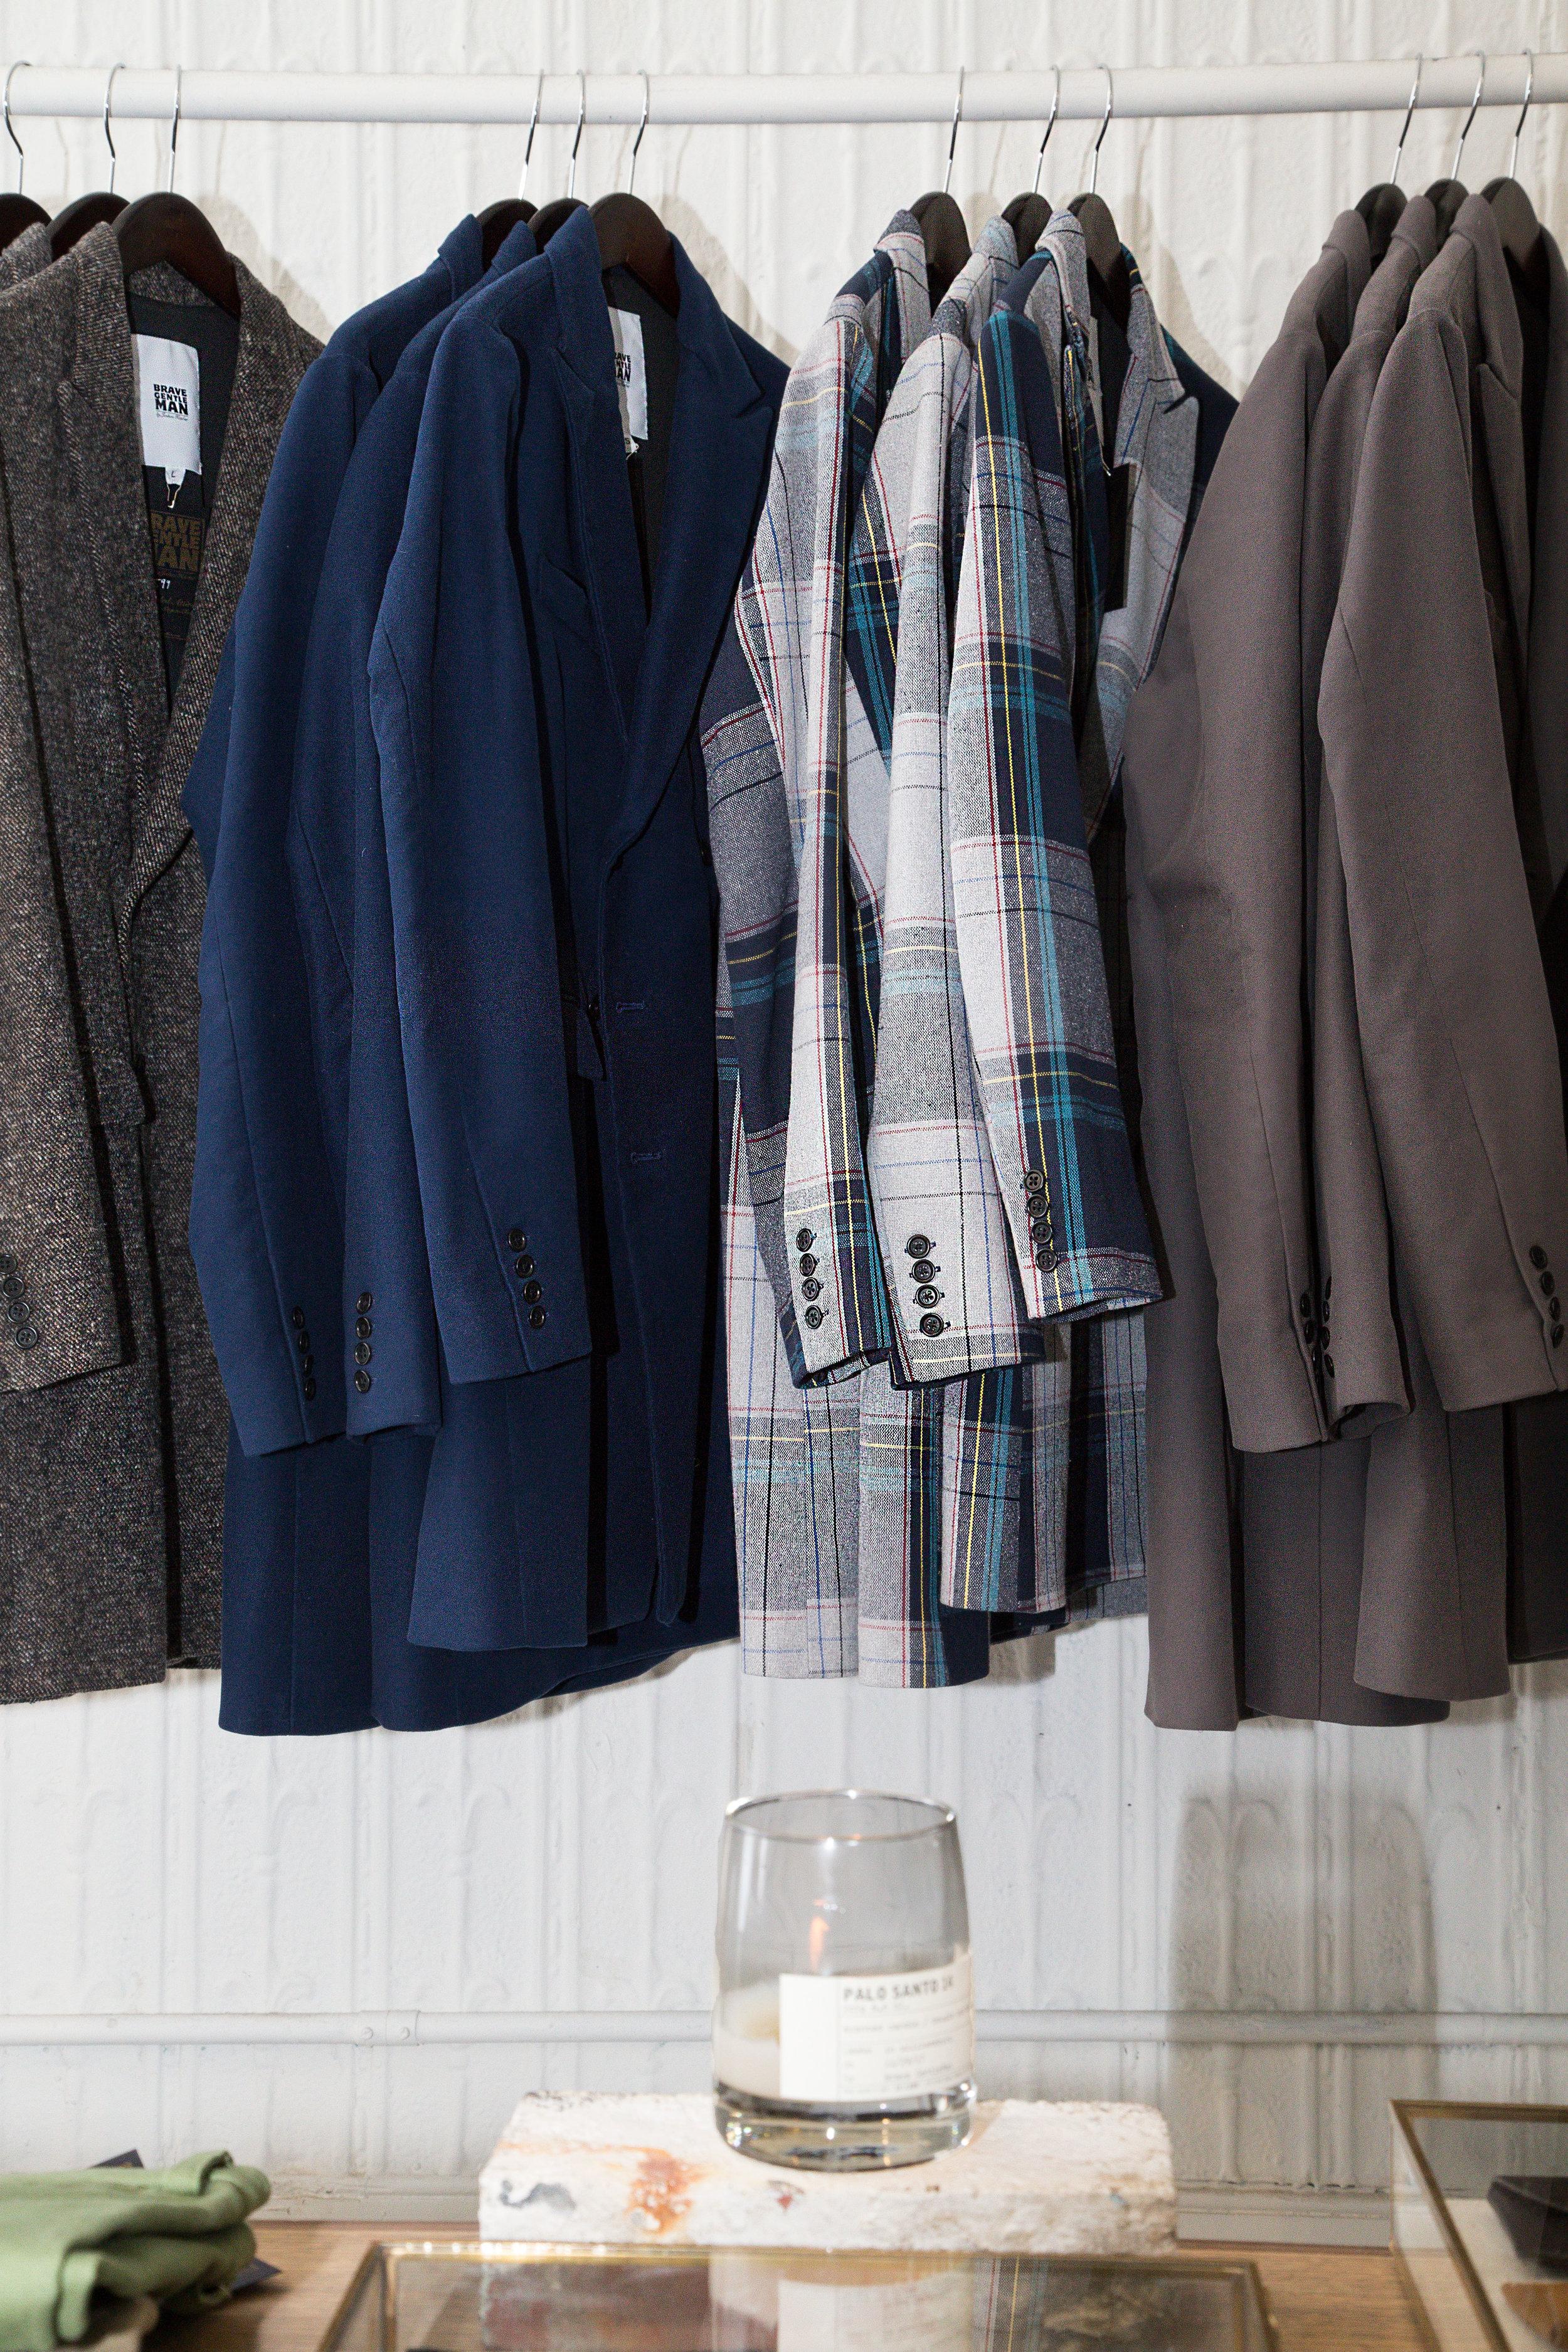 Outerwear selection.